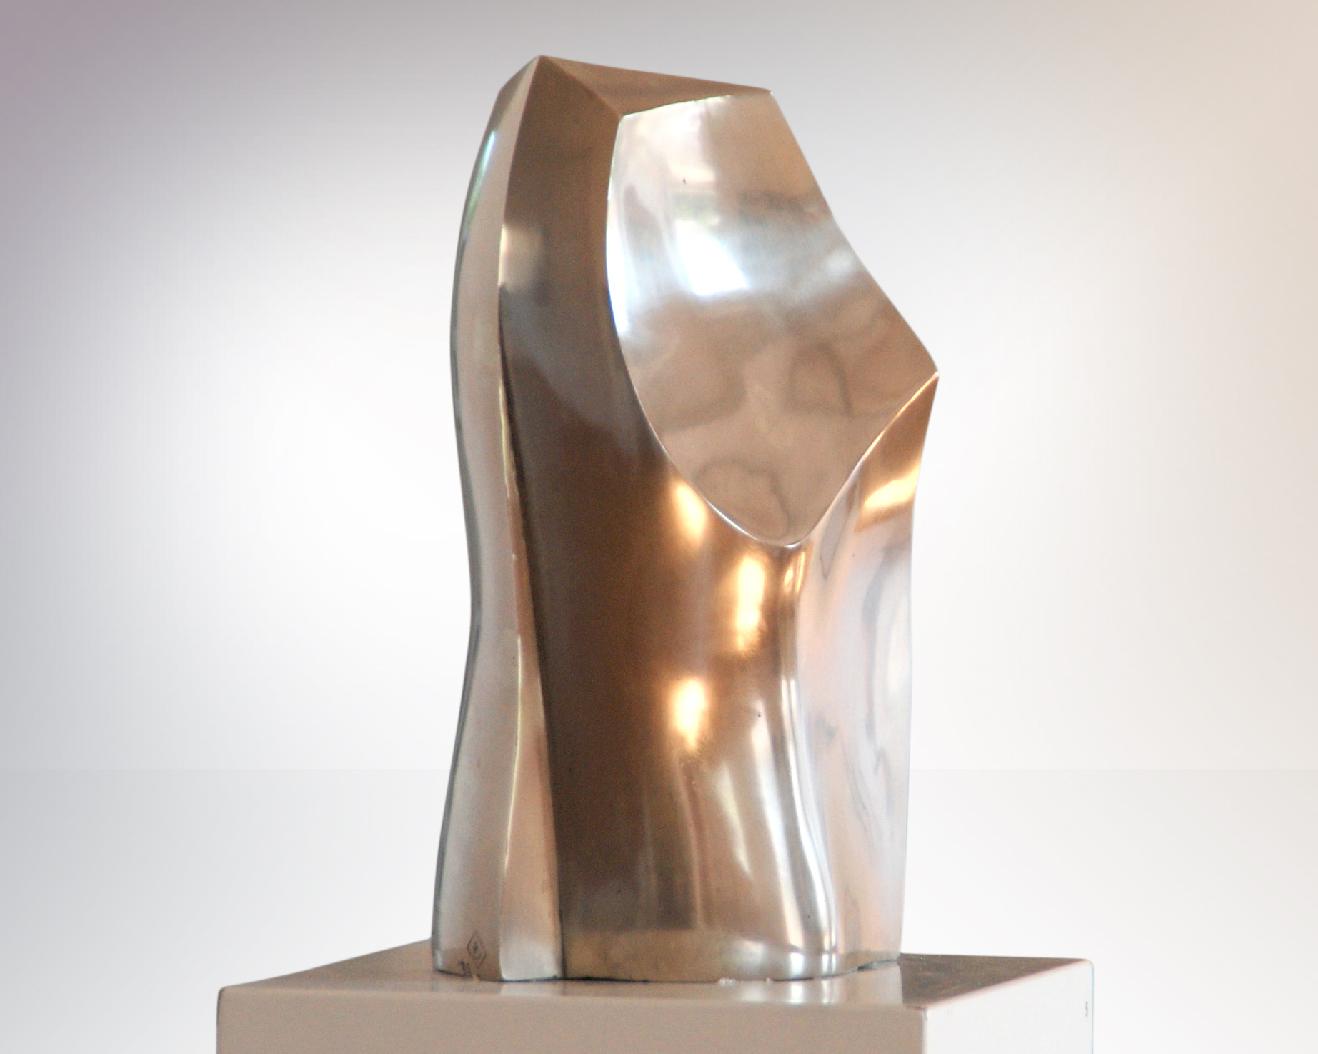 Sculpture-Phonix-Carola-Eggeling-SavannahBay